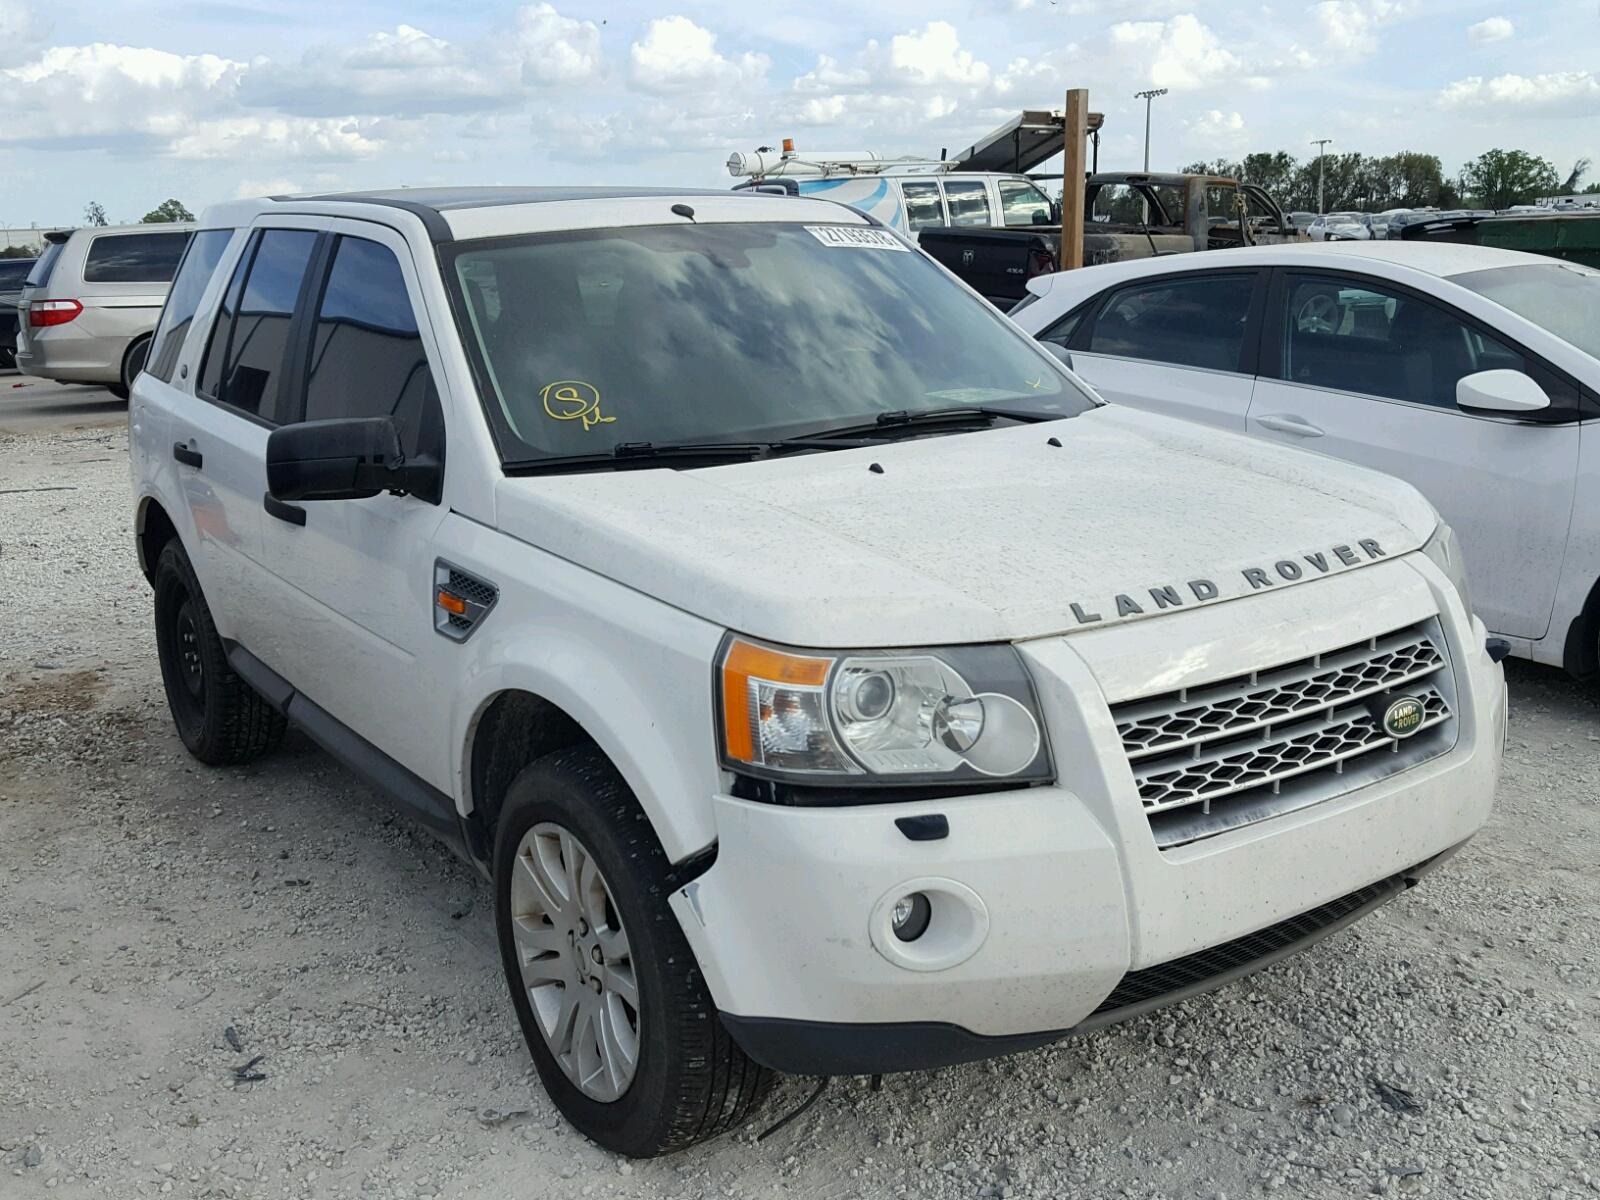 redmond rover sale white for watch seattle landrover alaska land se